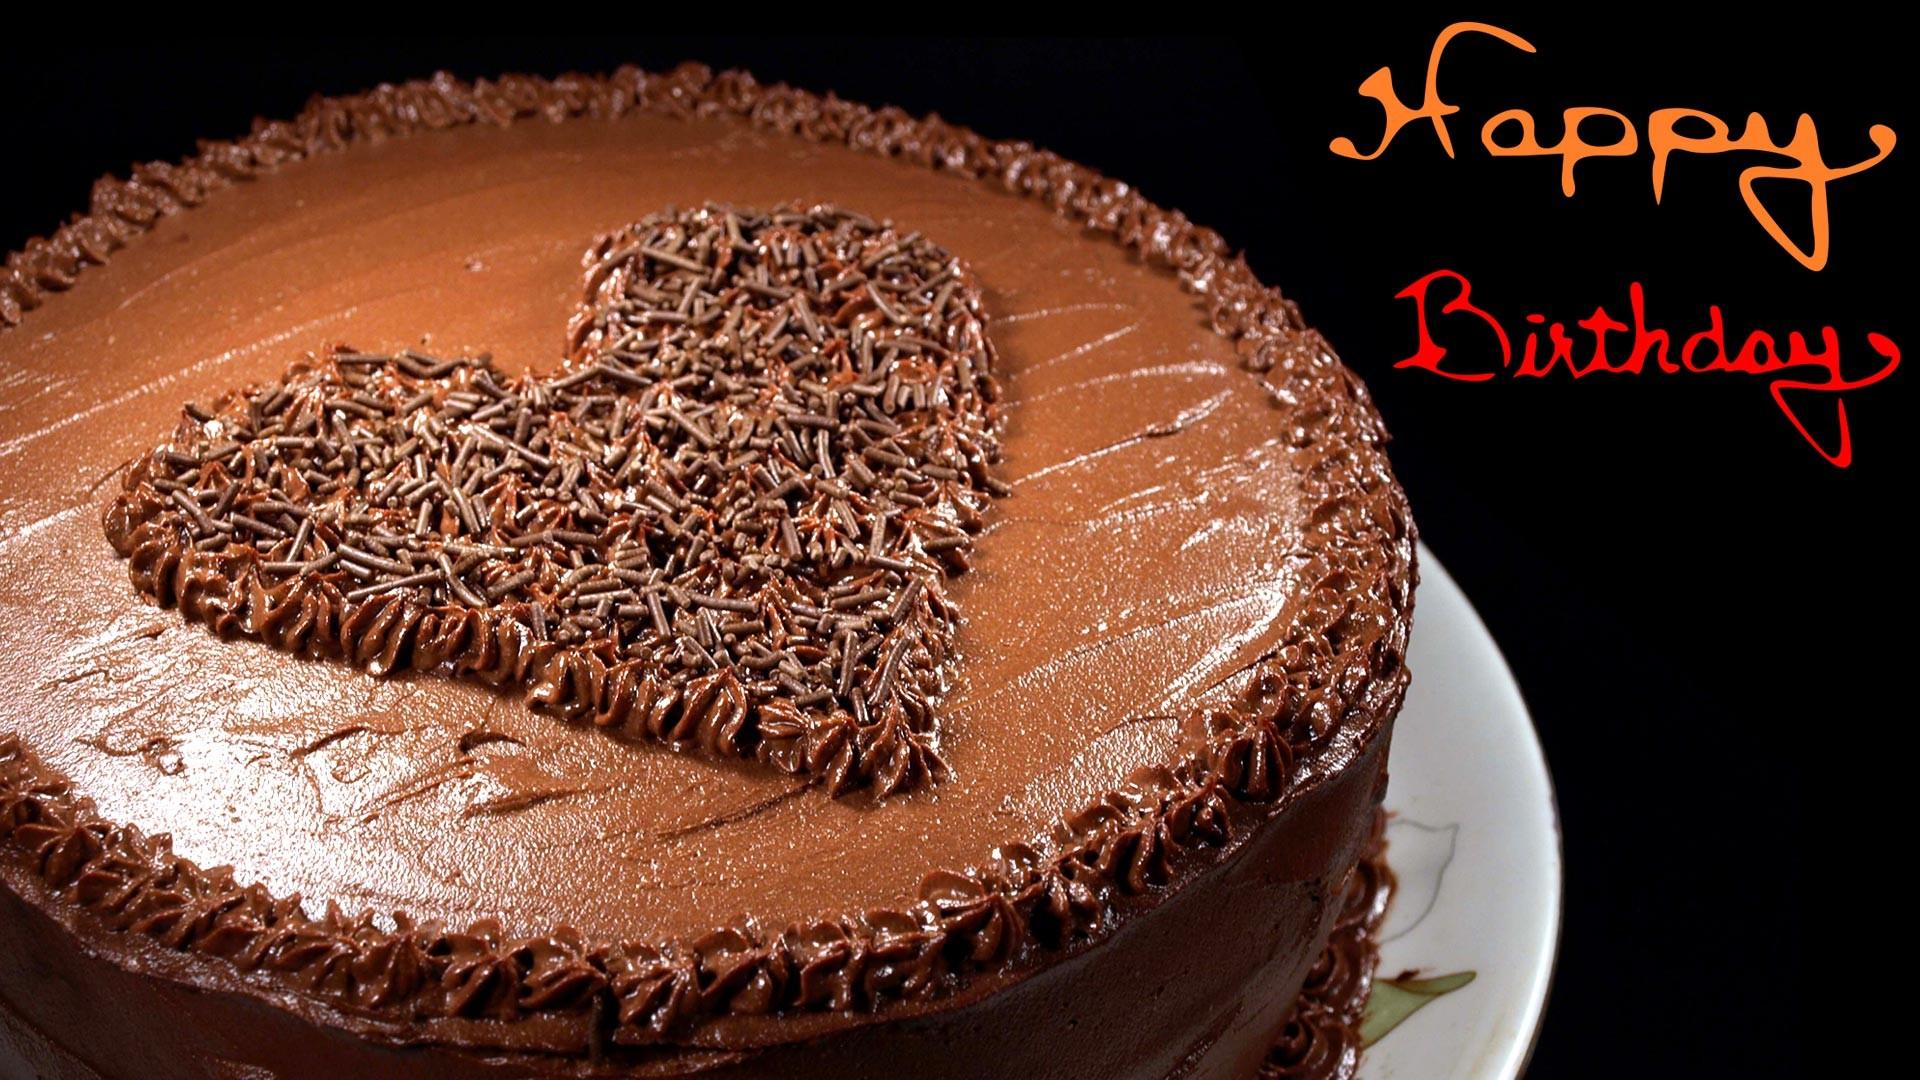 Happy Birthday Chocolate Cake Wallpaper Hd Desktop - Happy Birthday Best Friend Tamil , HD Wallpaper & Backgrounds